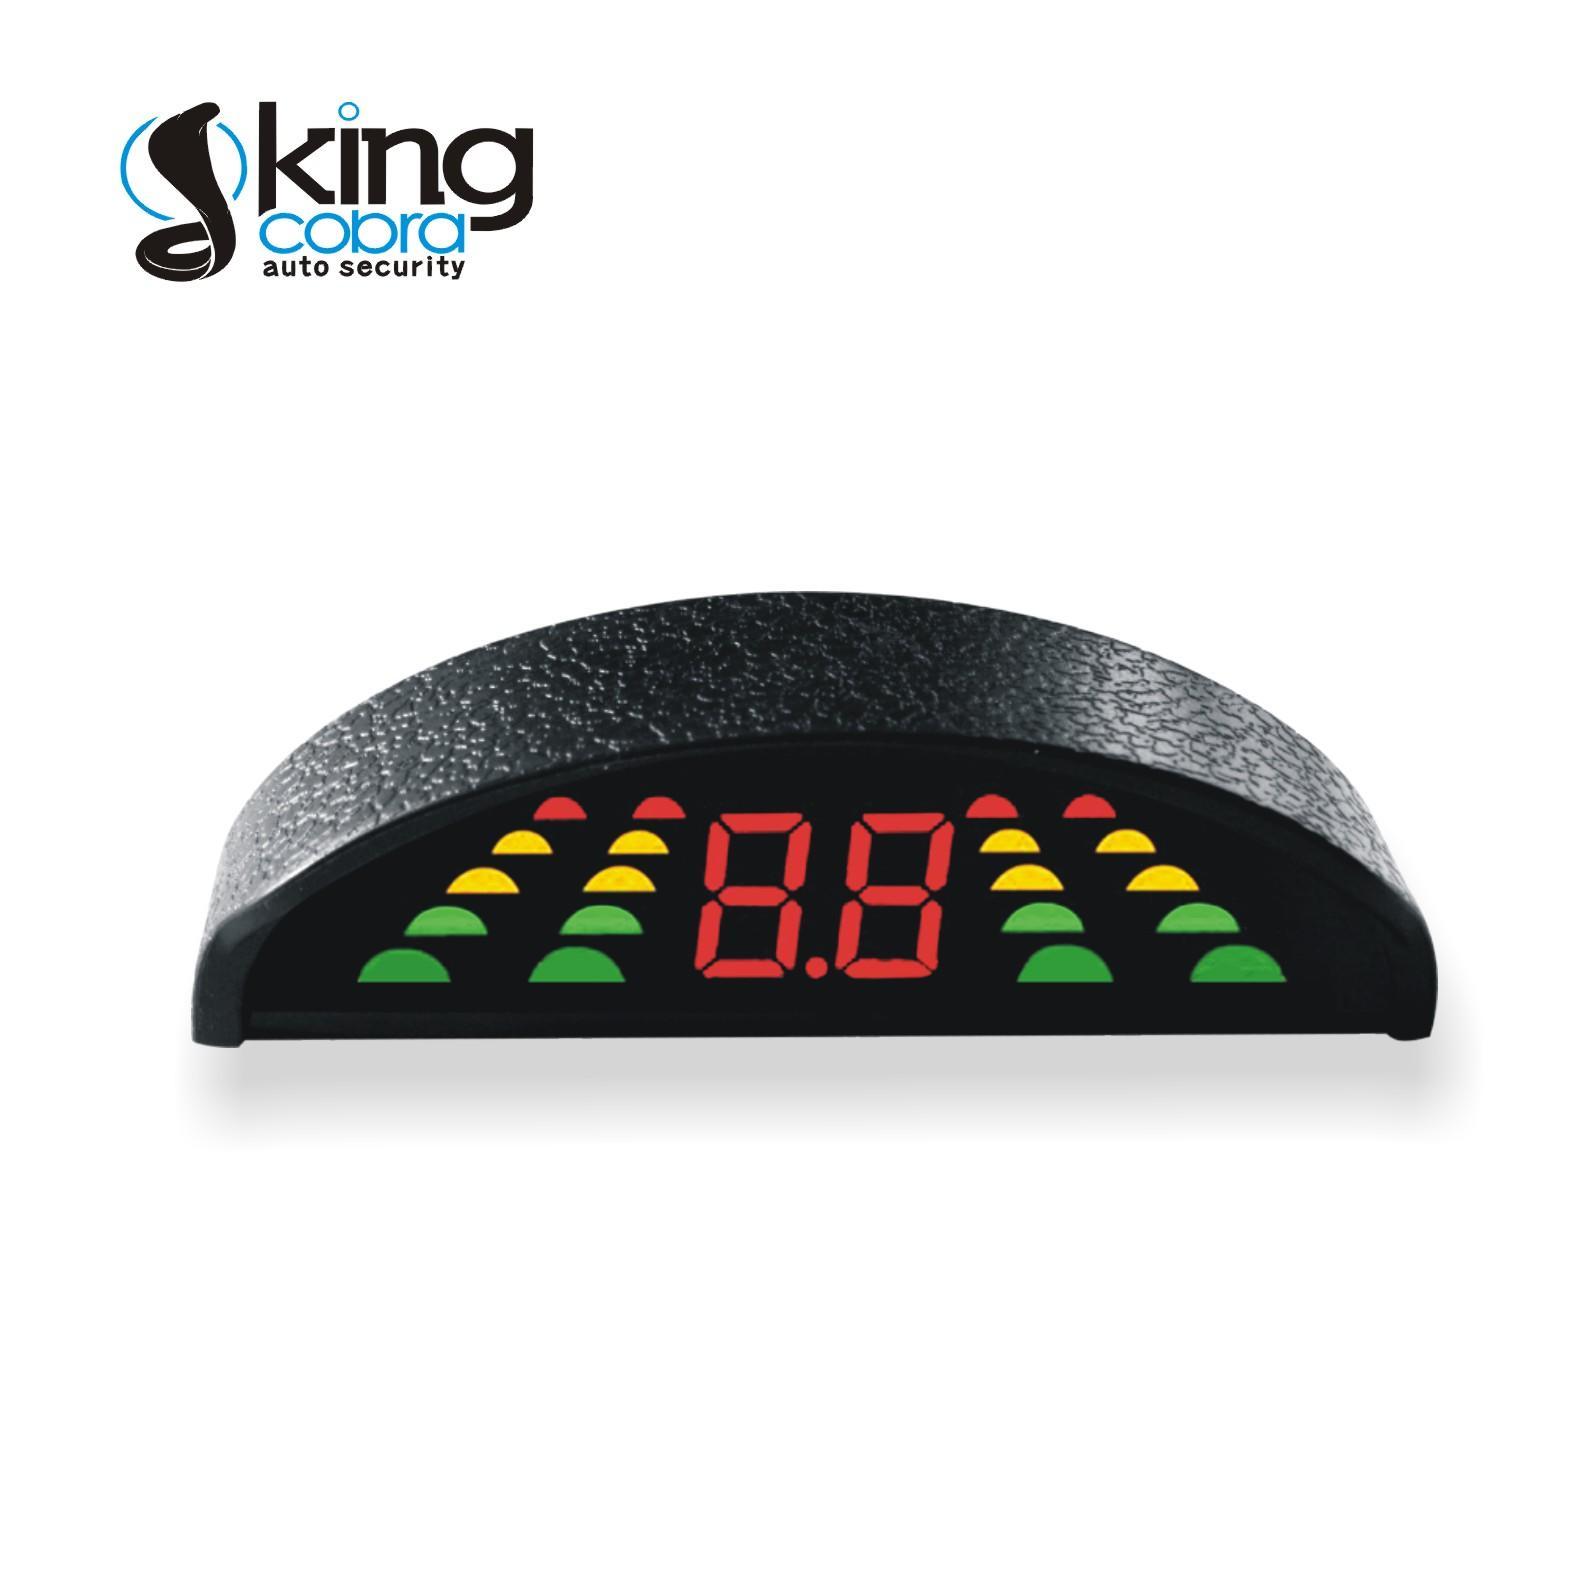 KC-6000N auto accessories Parking Assistant System